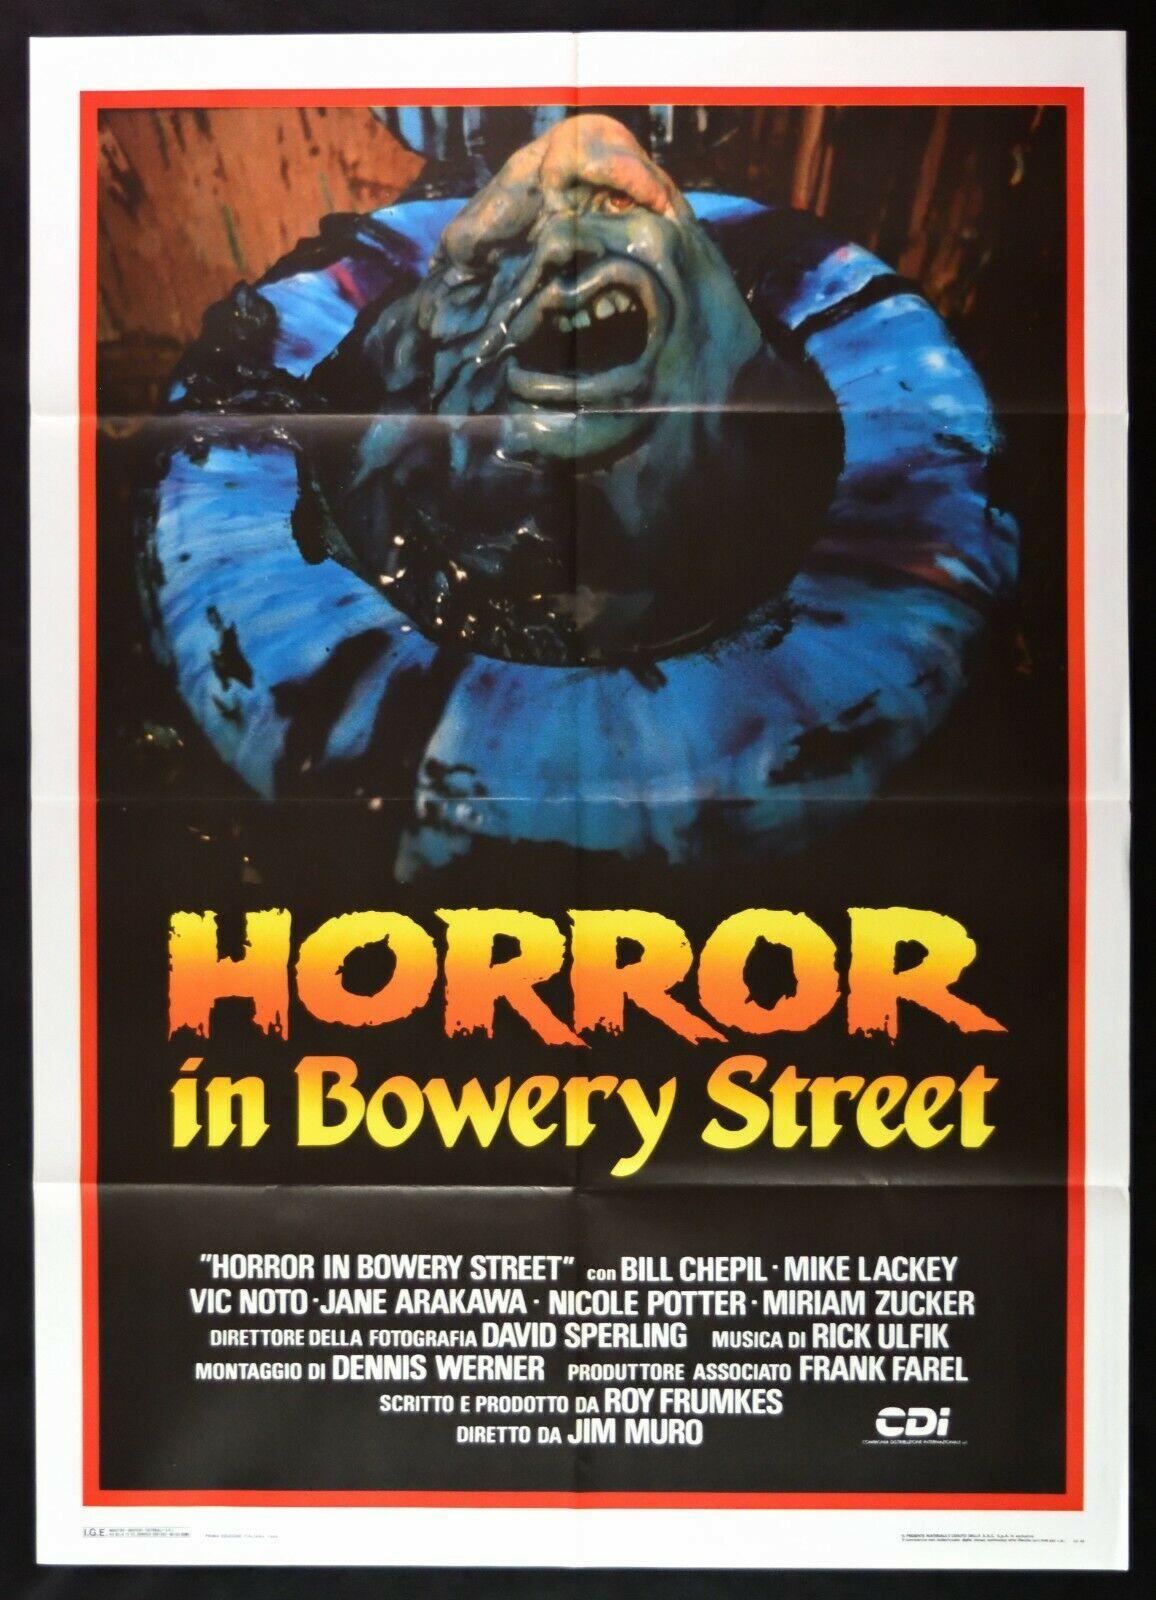 [EXTRA] Street Trash – Horror in Bowery Street di Jim Muro